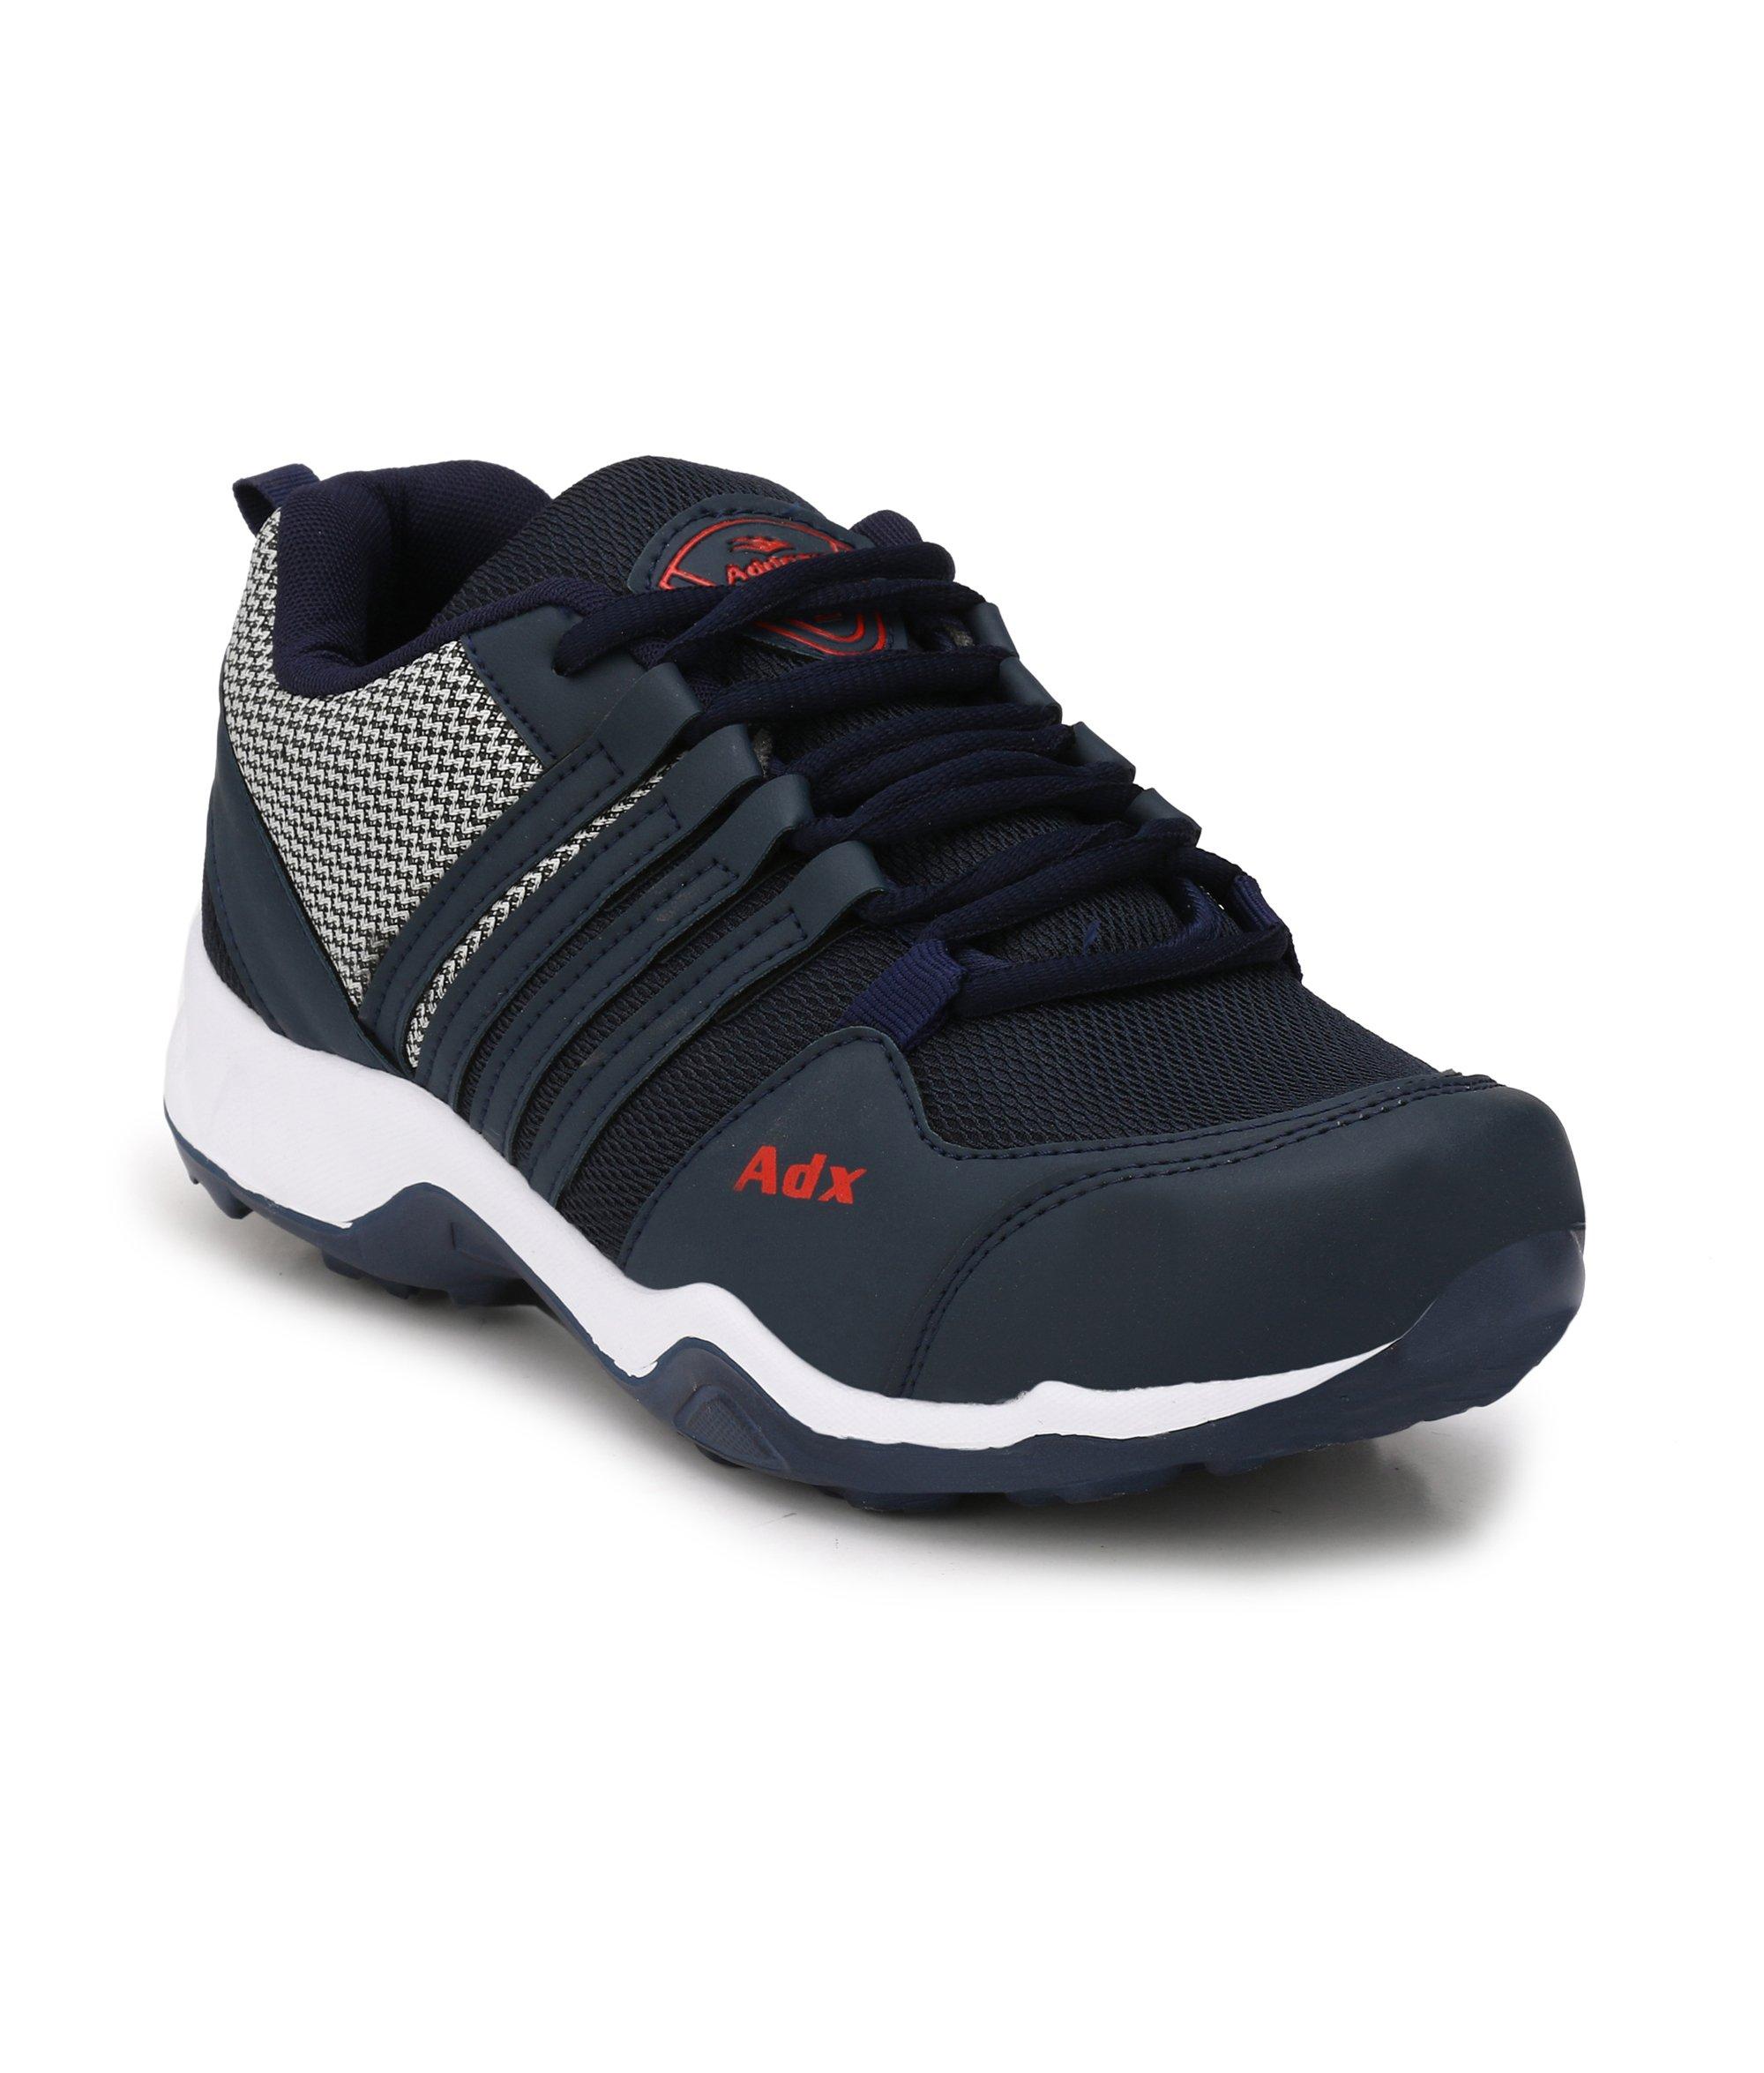 ADDOXY RADO-1 Men's Running Shoes- Buy